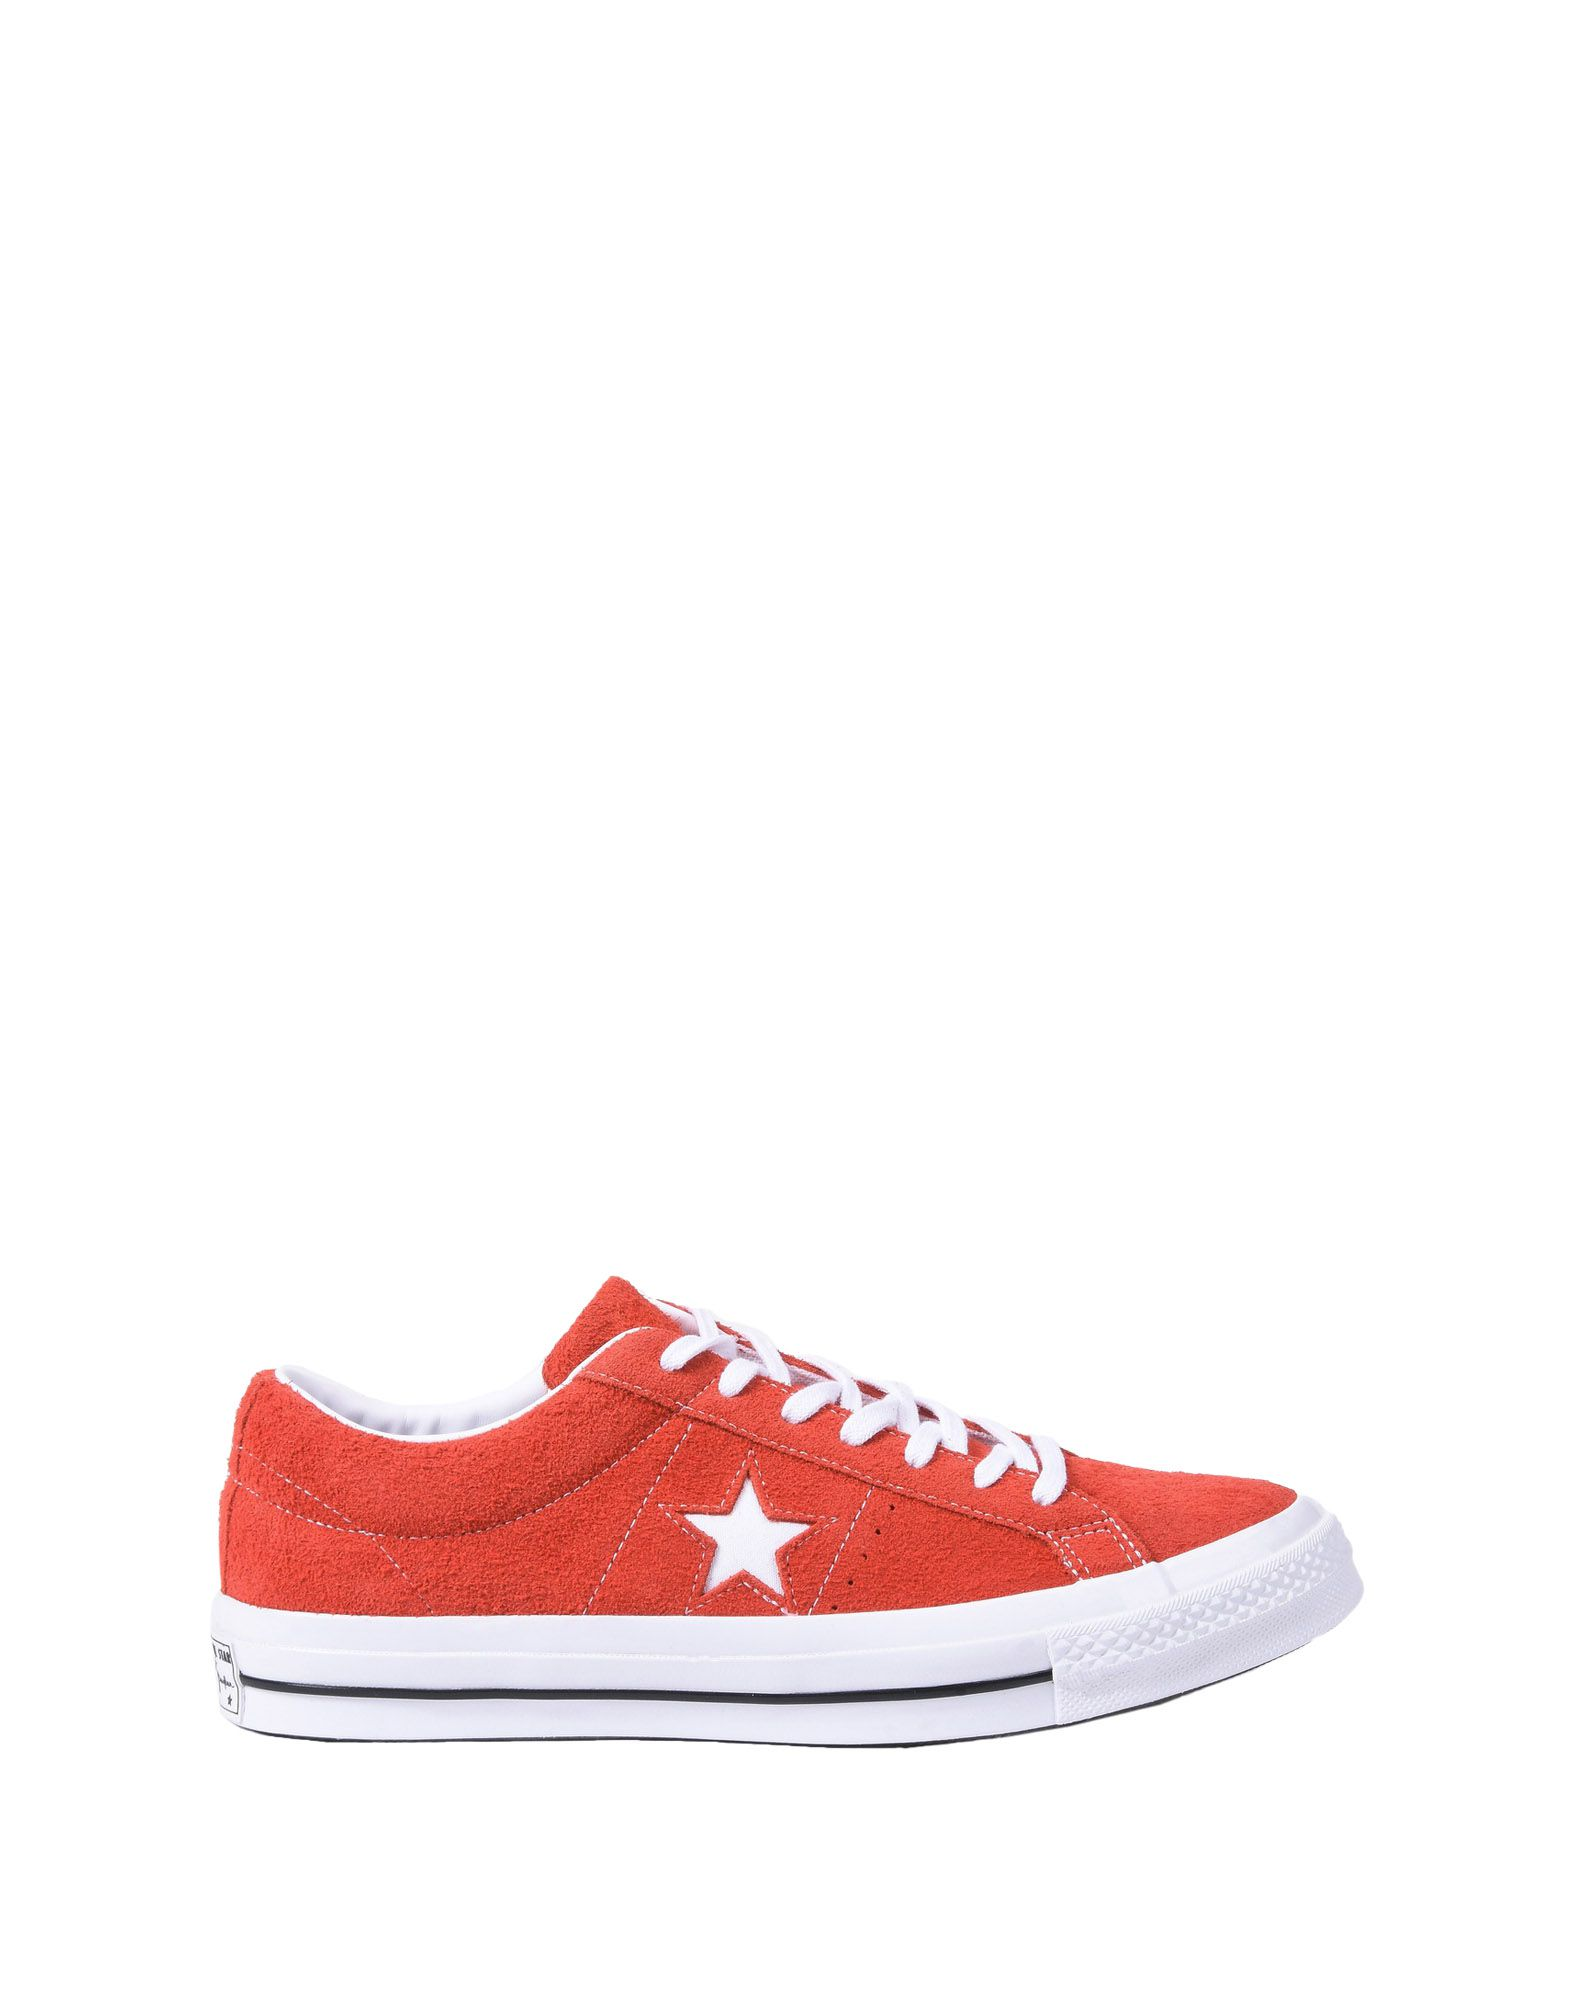 Converse All Star Star All One Star Ox Premium Suede - Uomo - 11328141WA 51a819